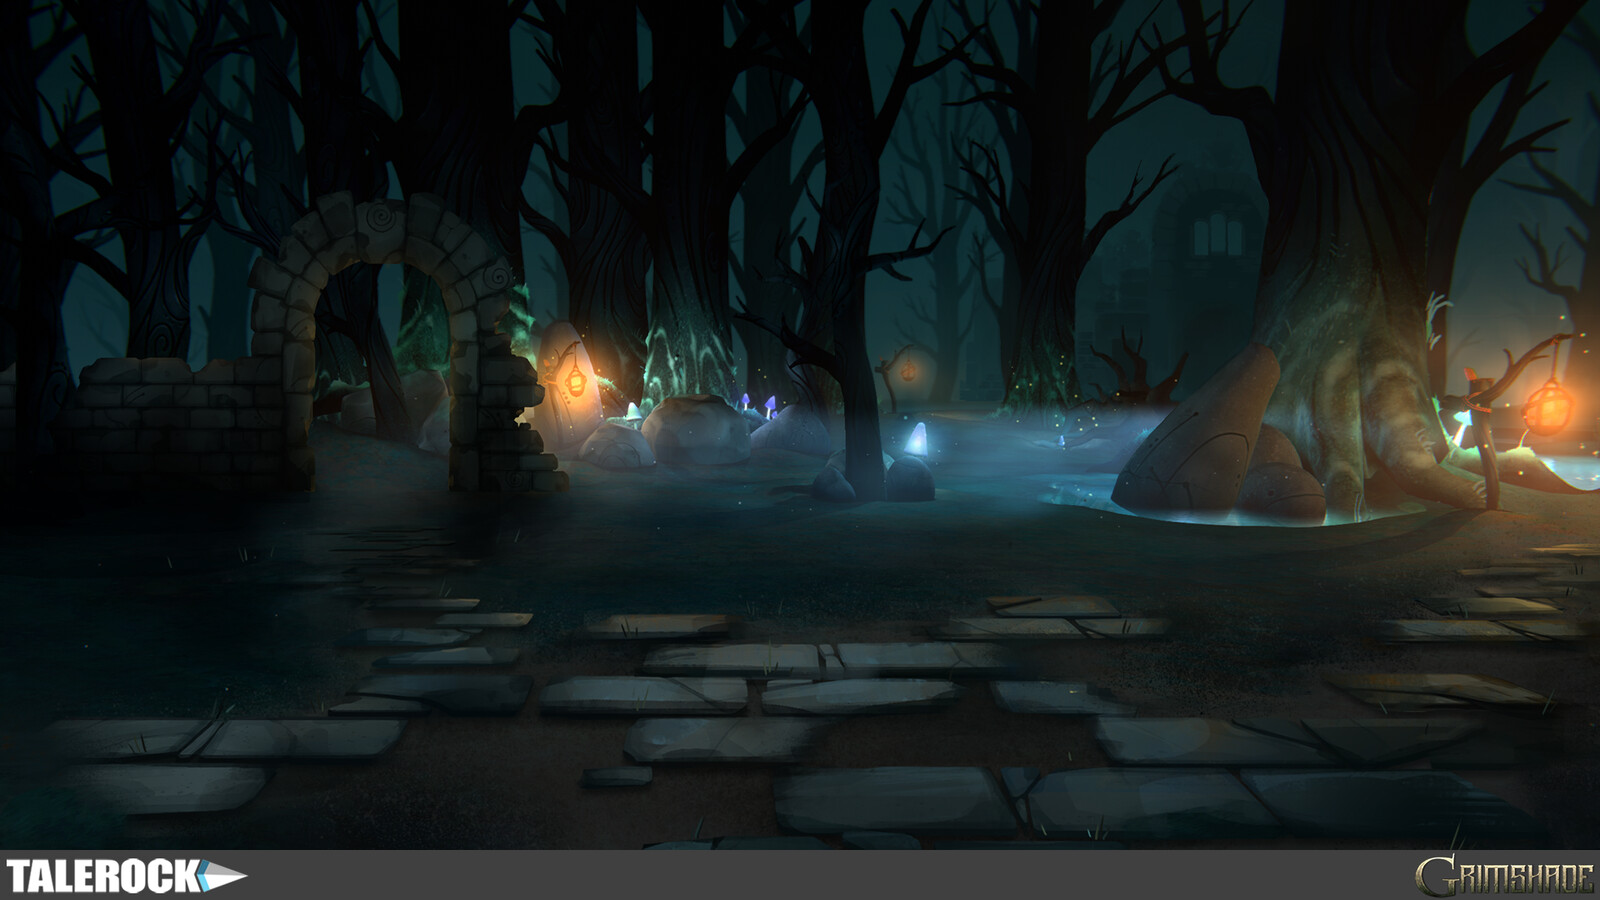 Arthu Ruins Battle Scene concept